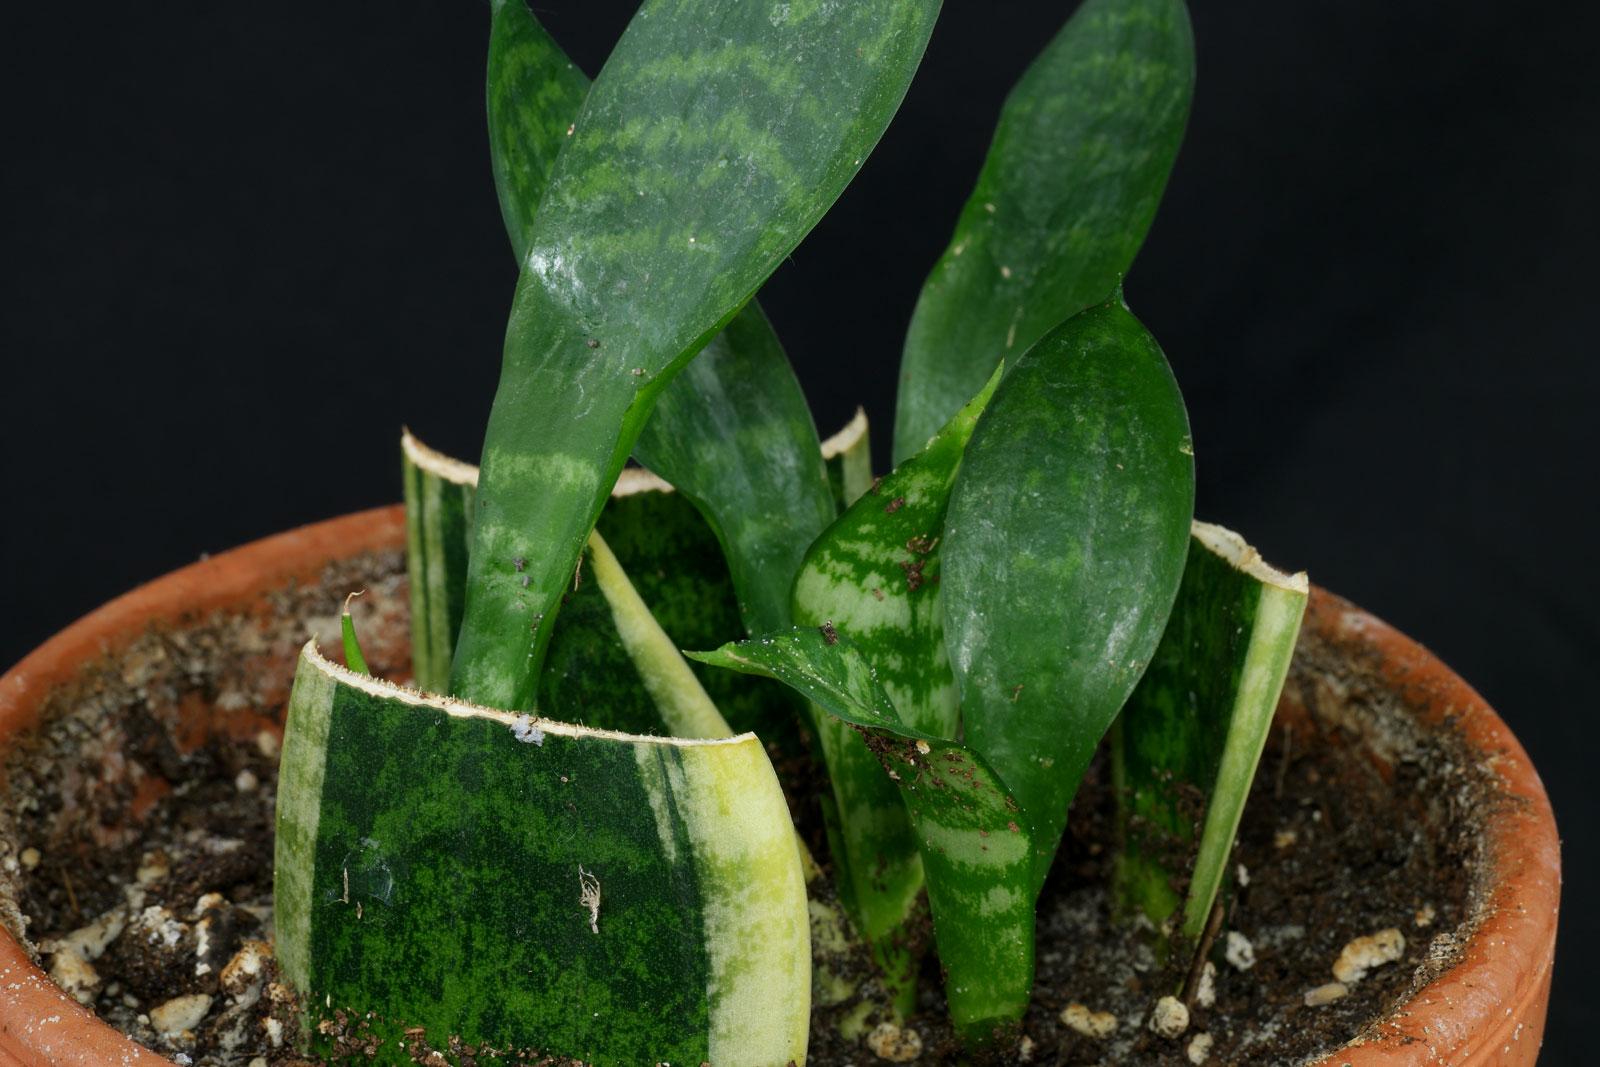 Sansevieria trifasciata Blattstecklinge